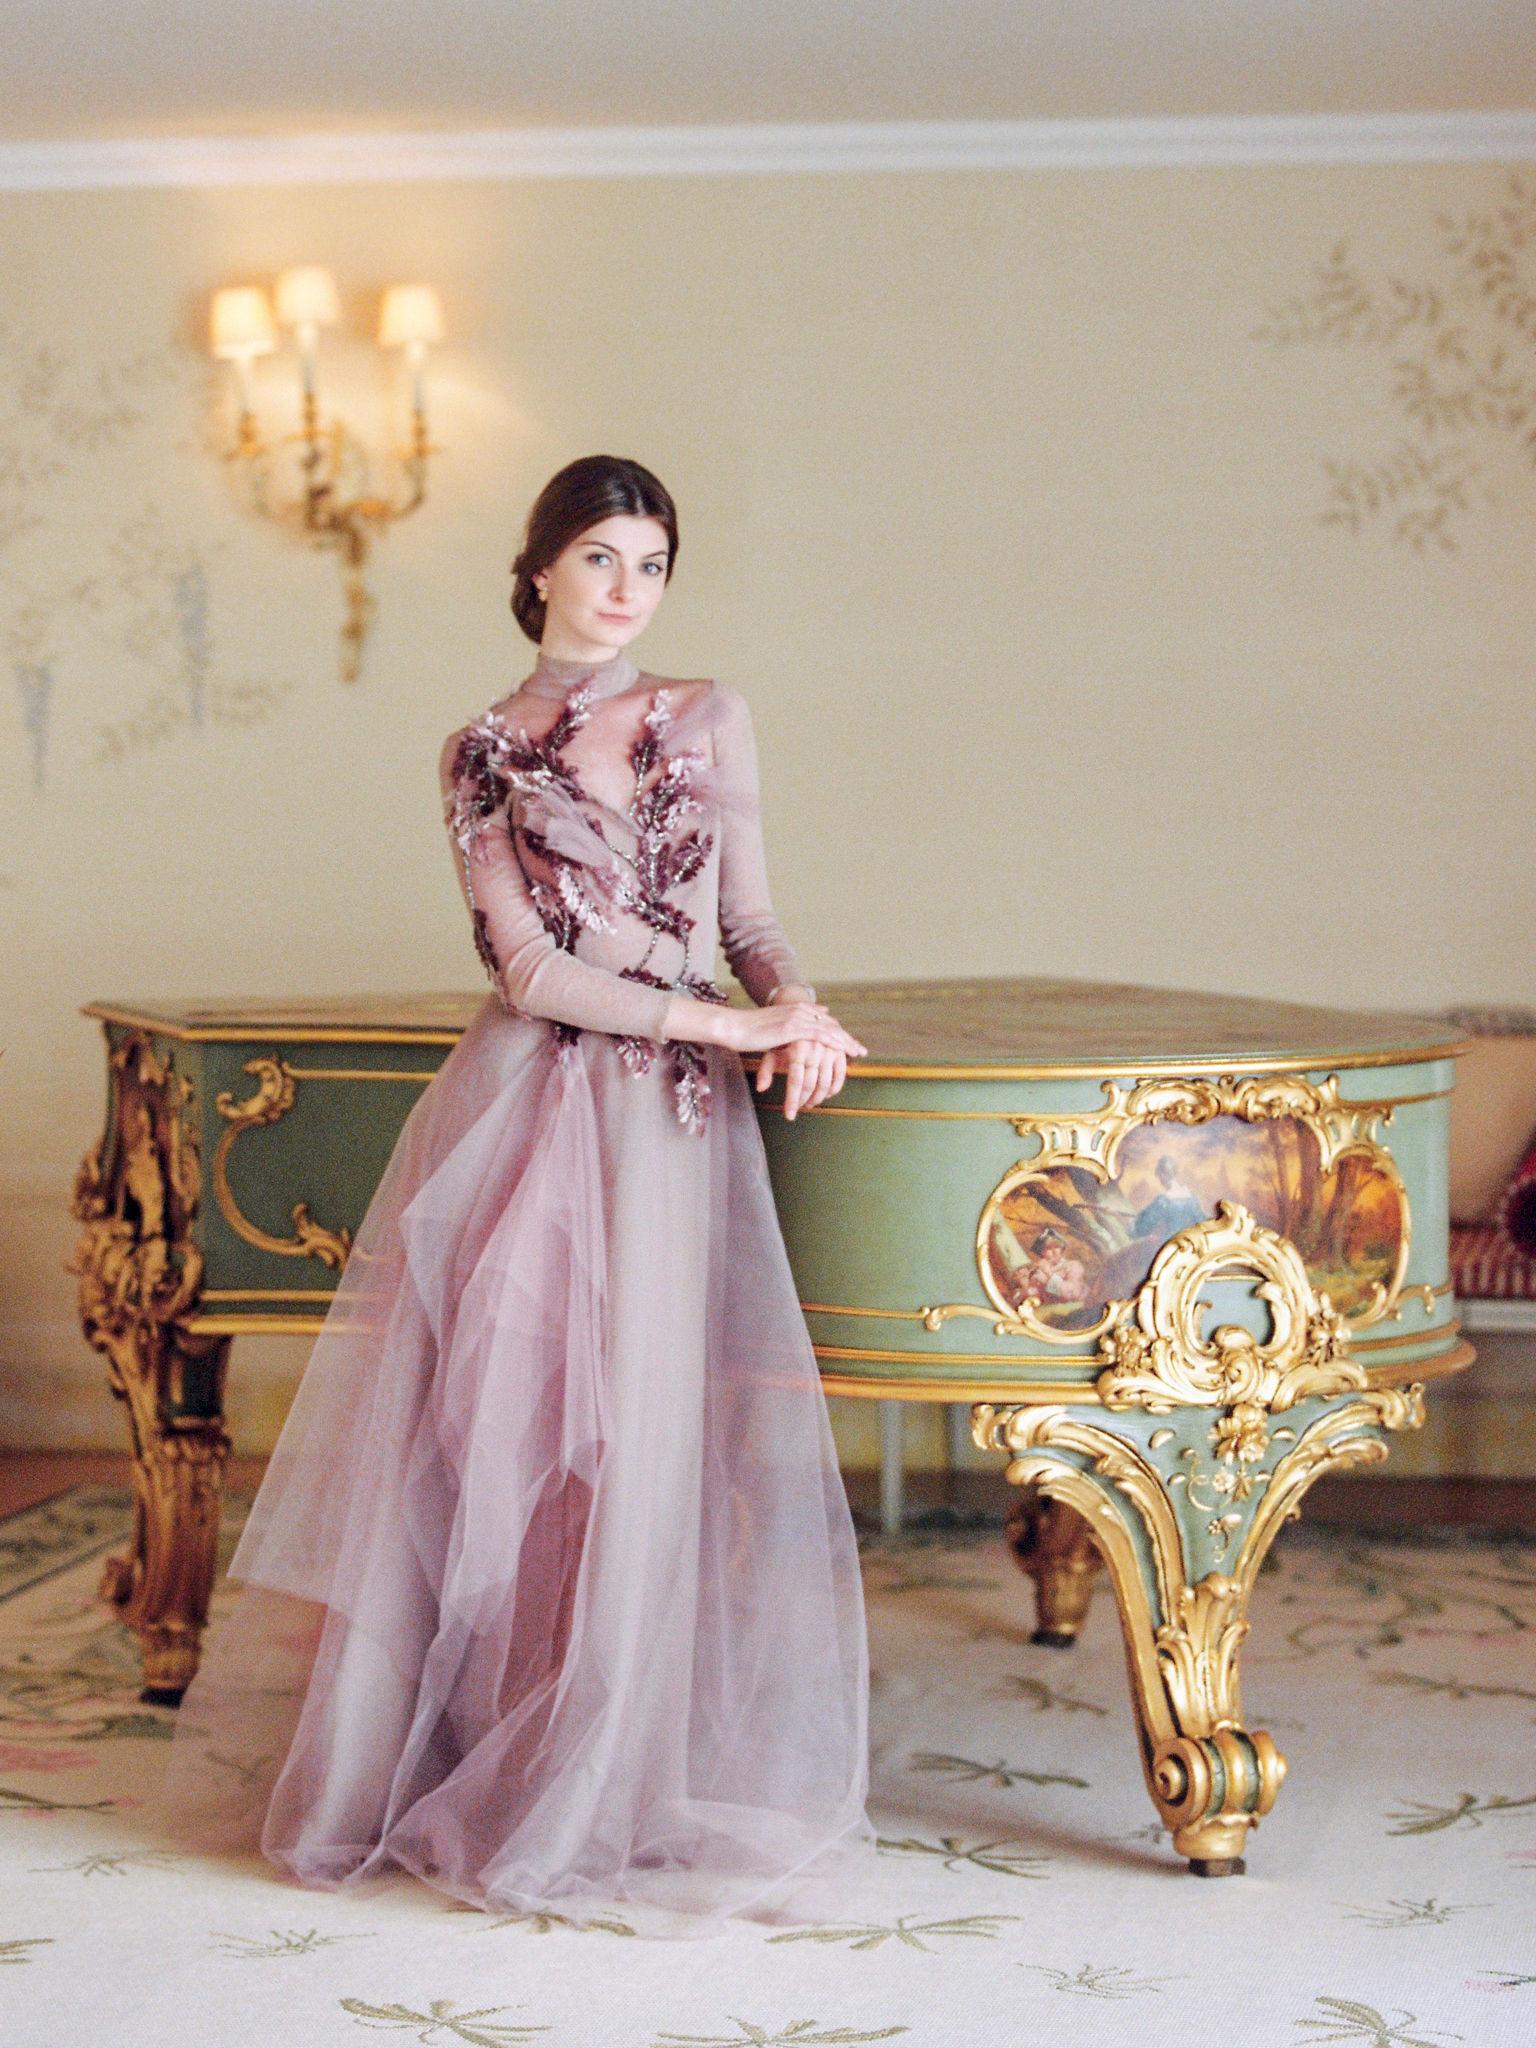 portugal-wedding-photography-elegance-044.jpg